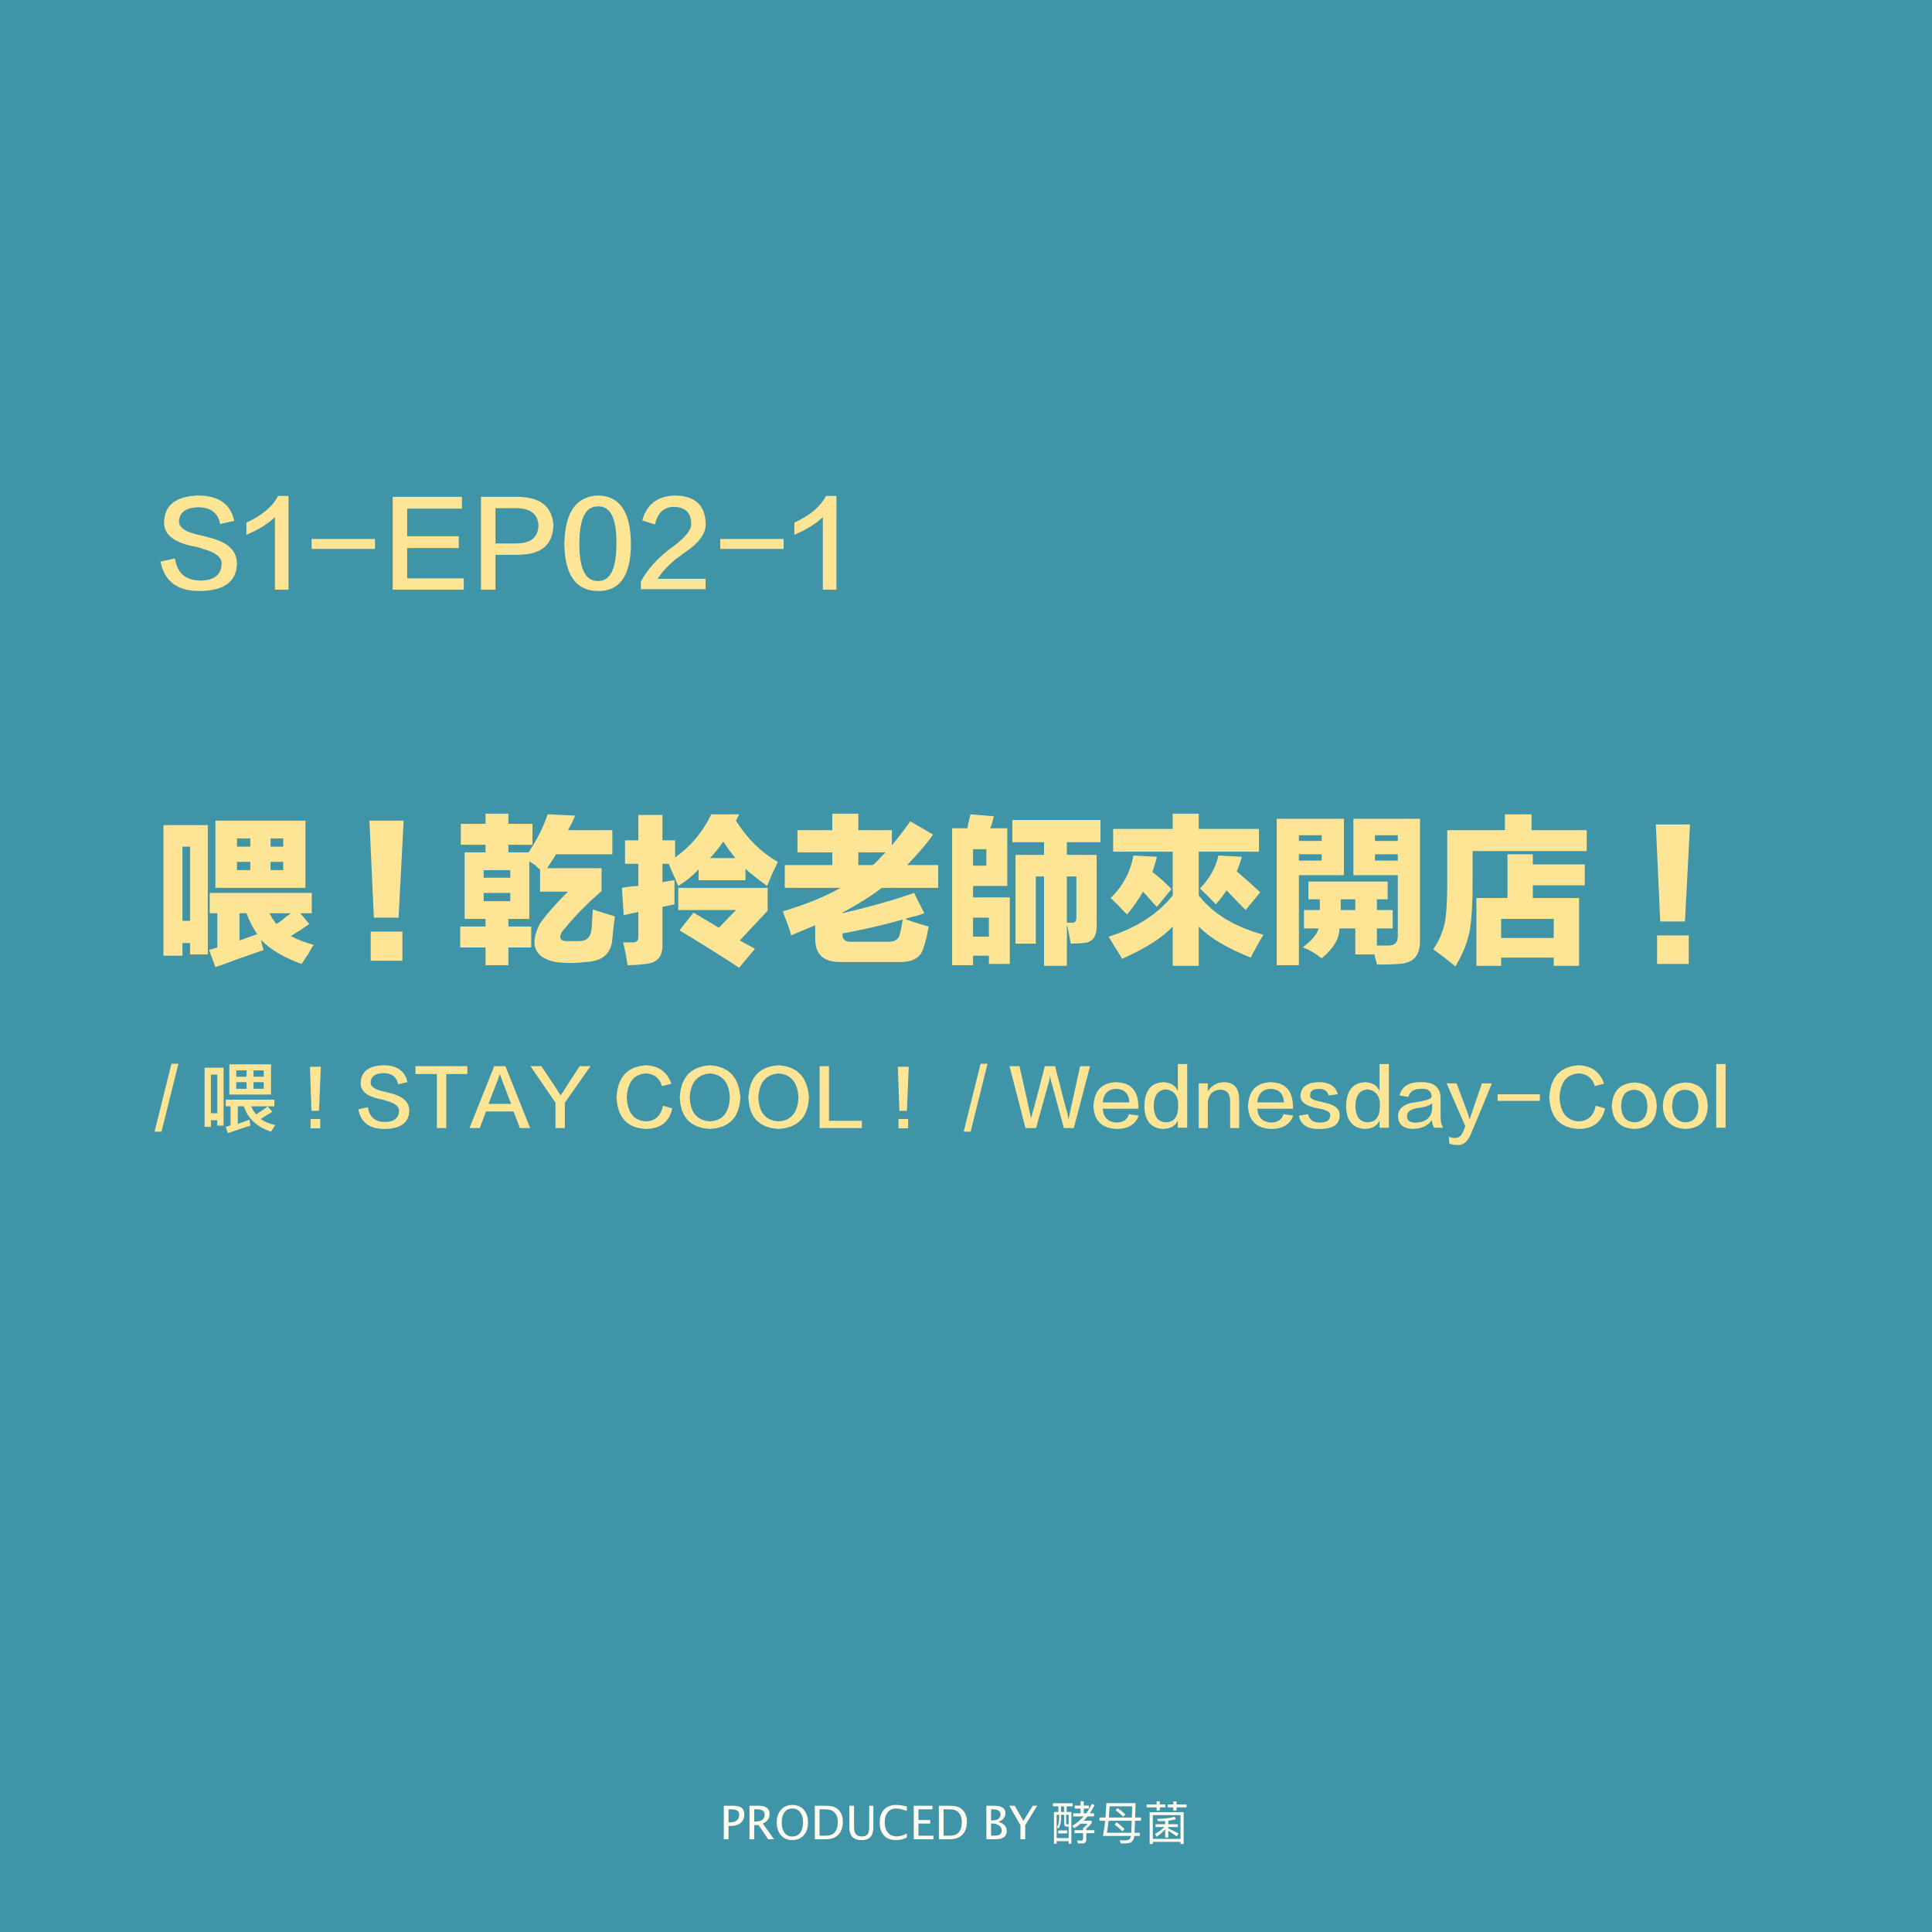 S1-EP02-1 喂!乾拎老師來開店!